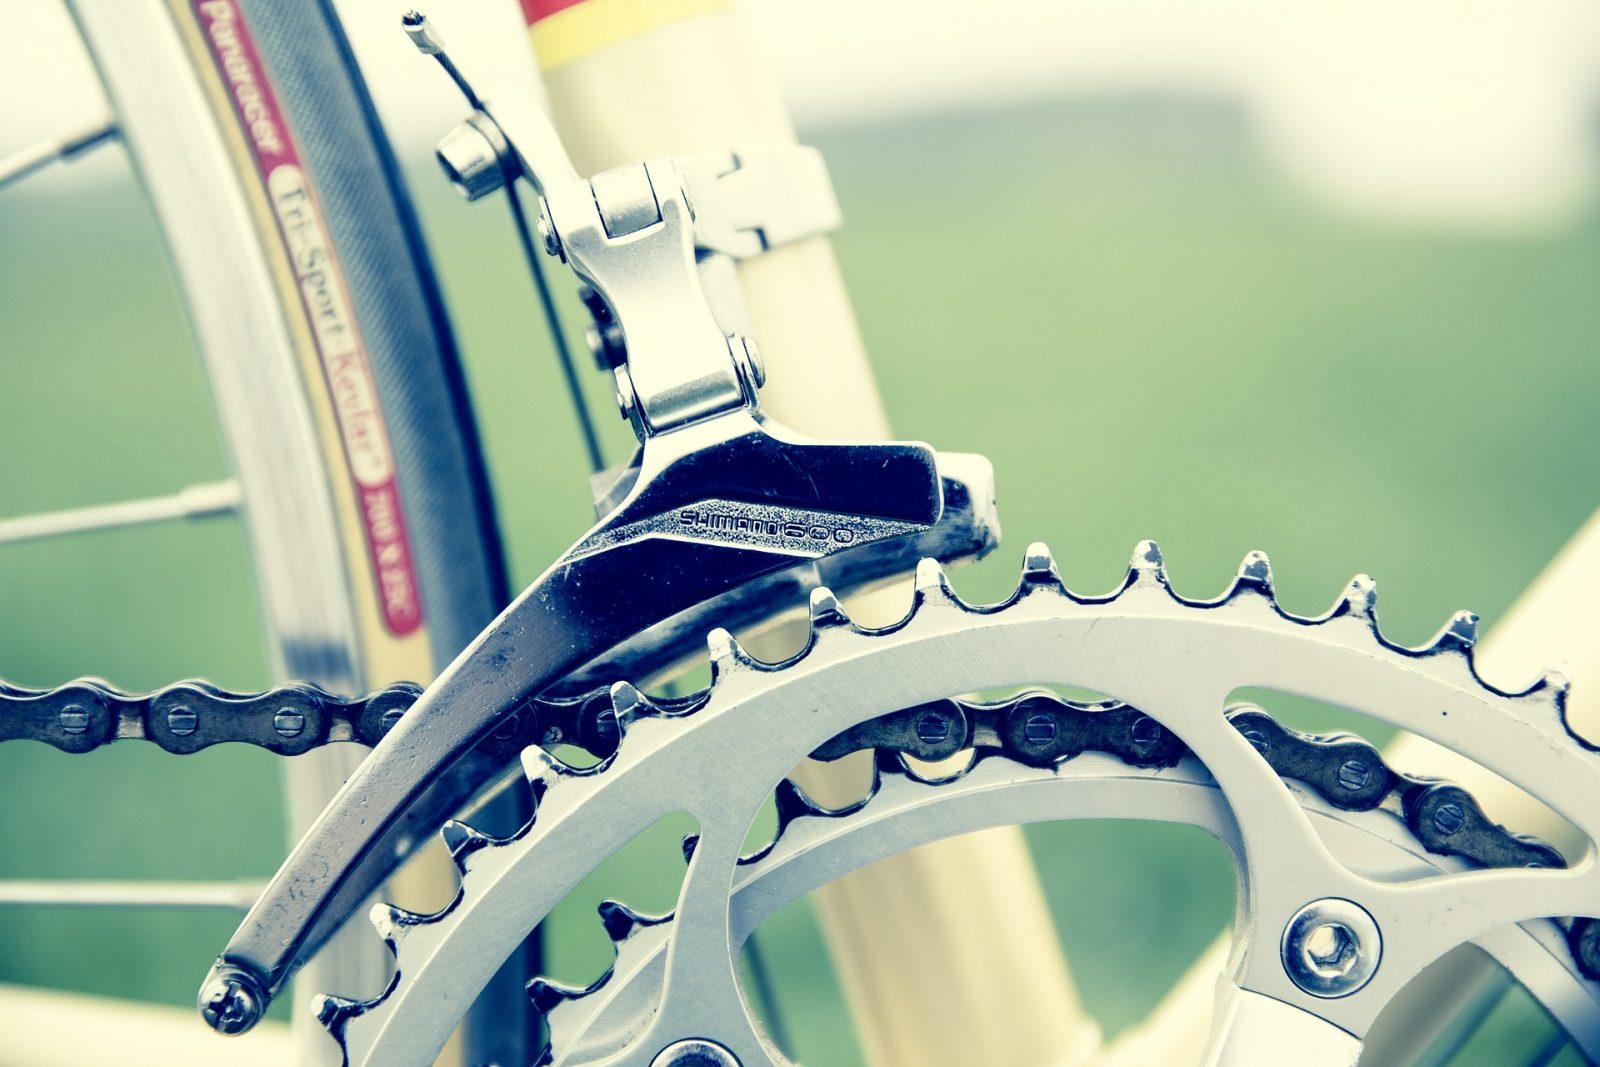 Scottish Inventions - Bike